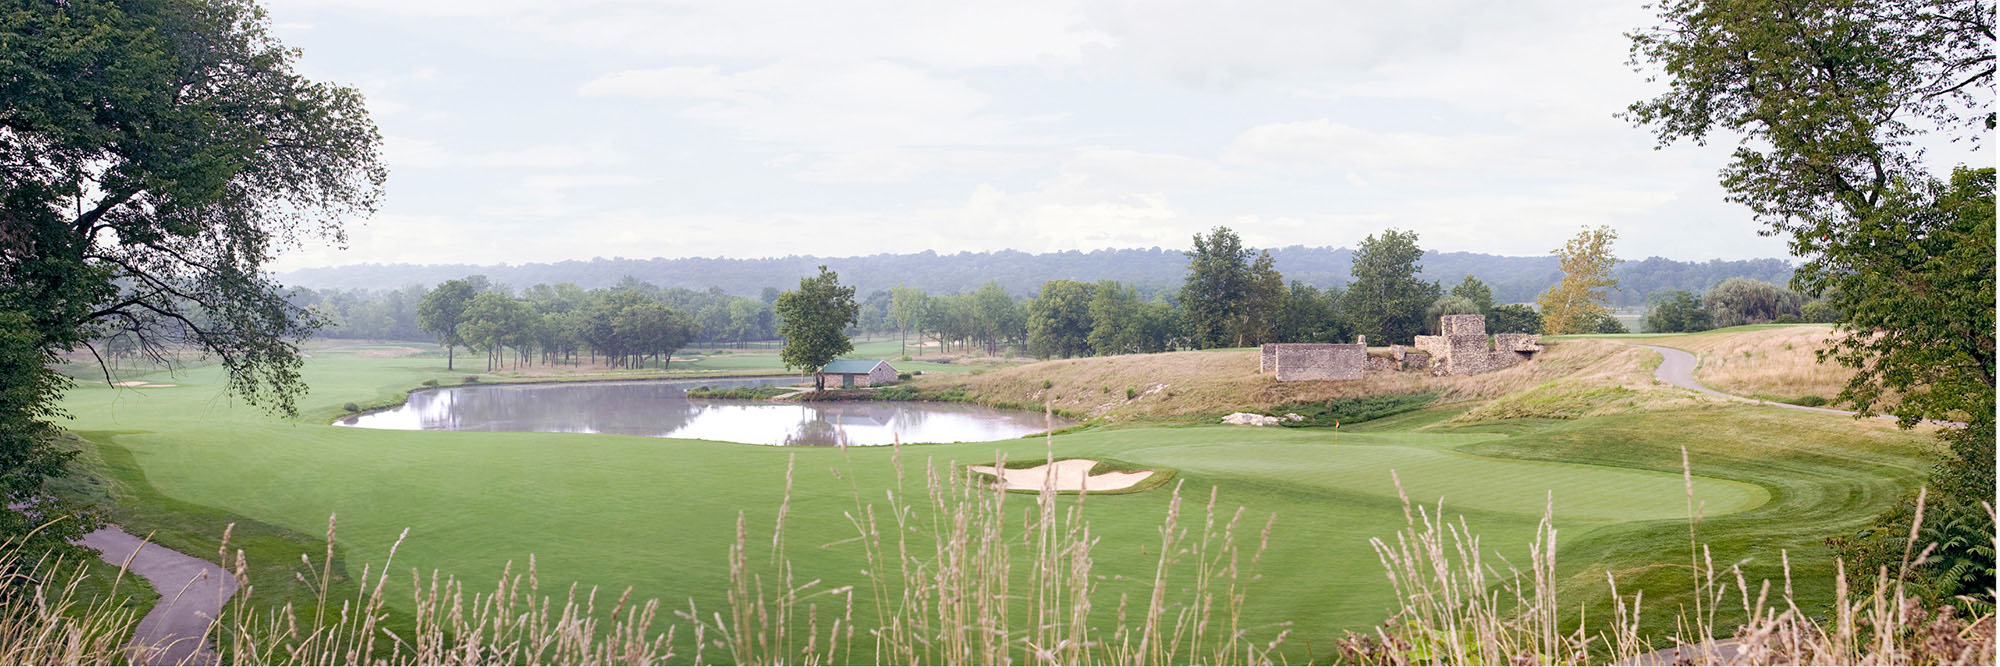 Golf Course Image - Philadelphia Cricket Club No. 3